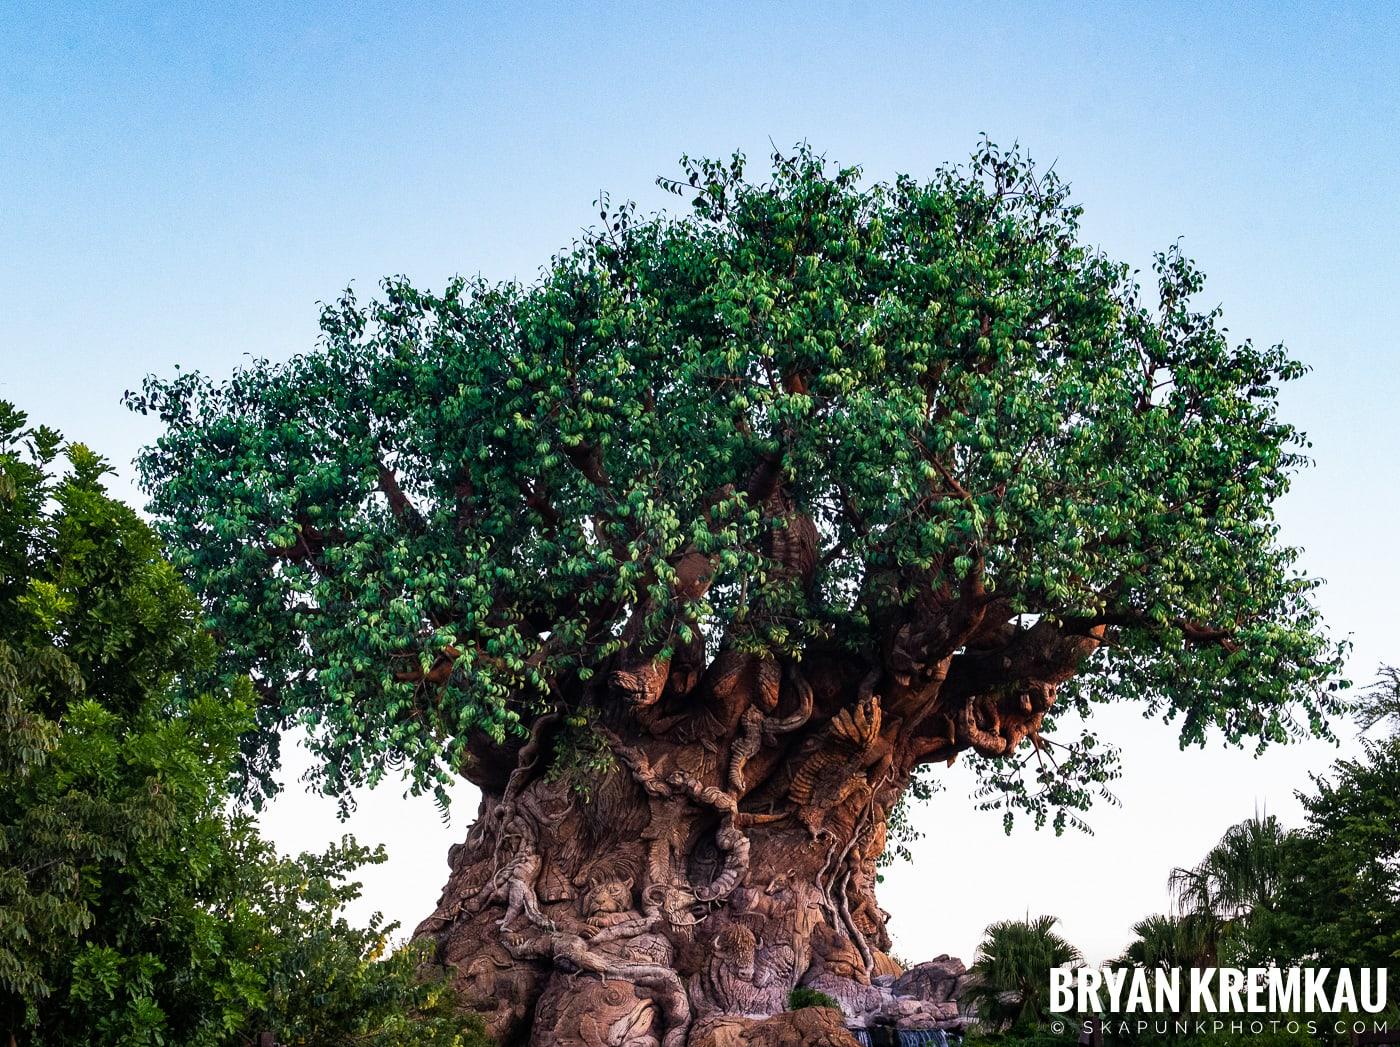 Walt Disney World Vacation: Day 5 (Animal Kingdom / Disney's Hollywood Studios) - 10.3.19 (83)